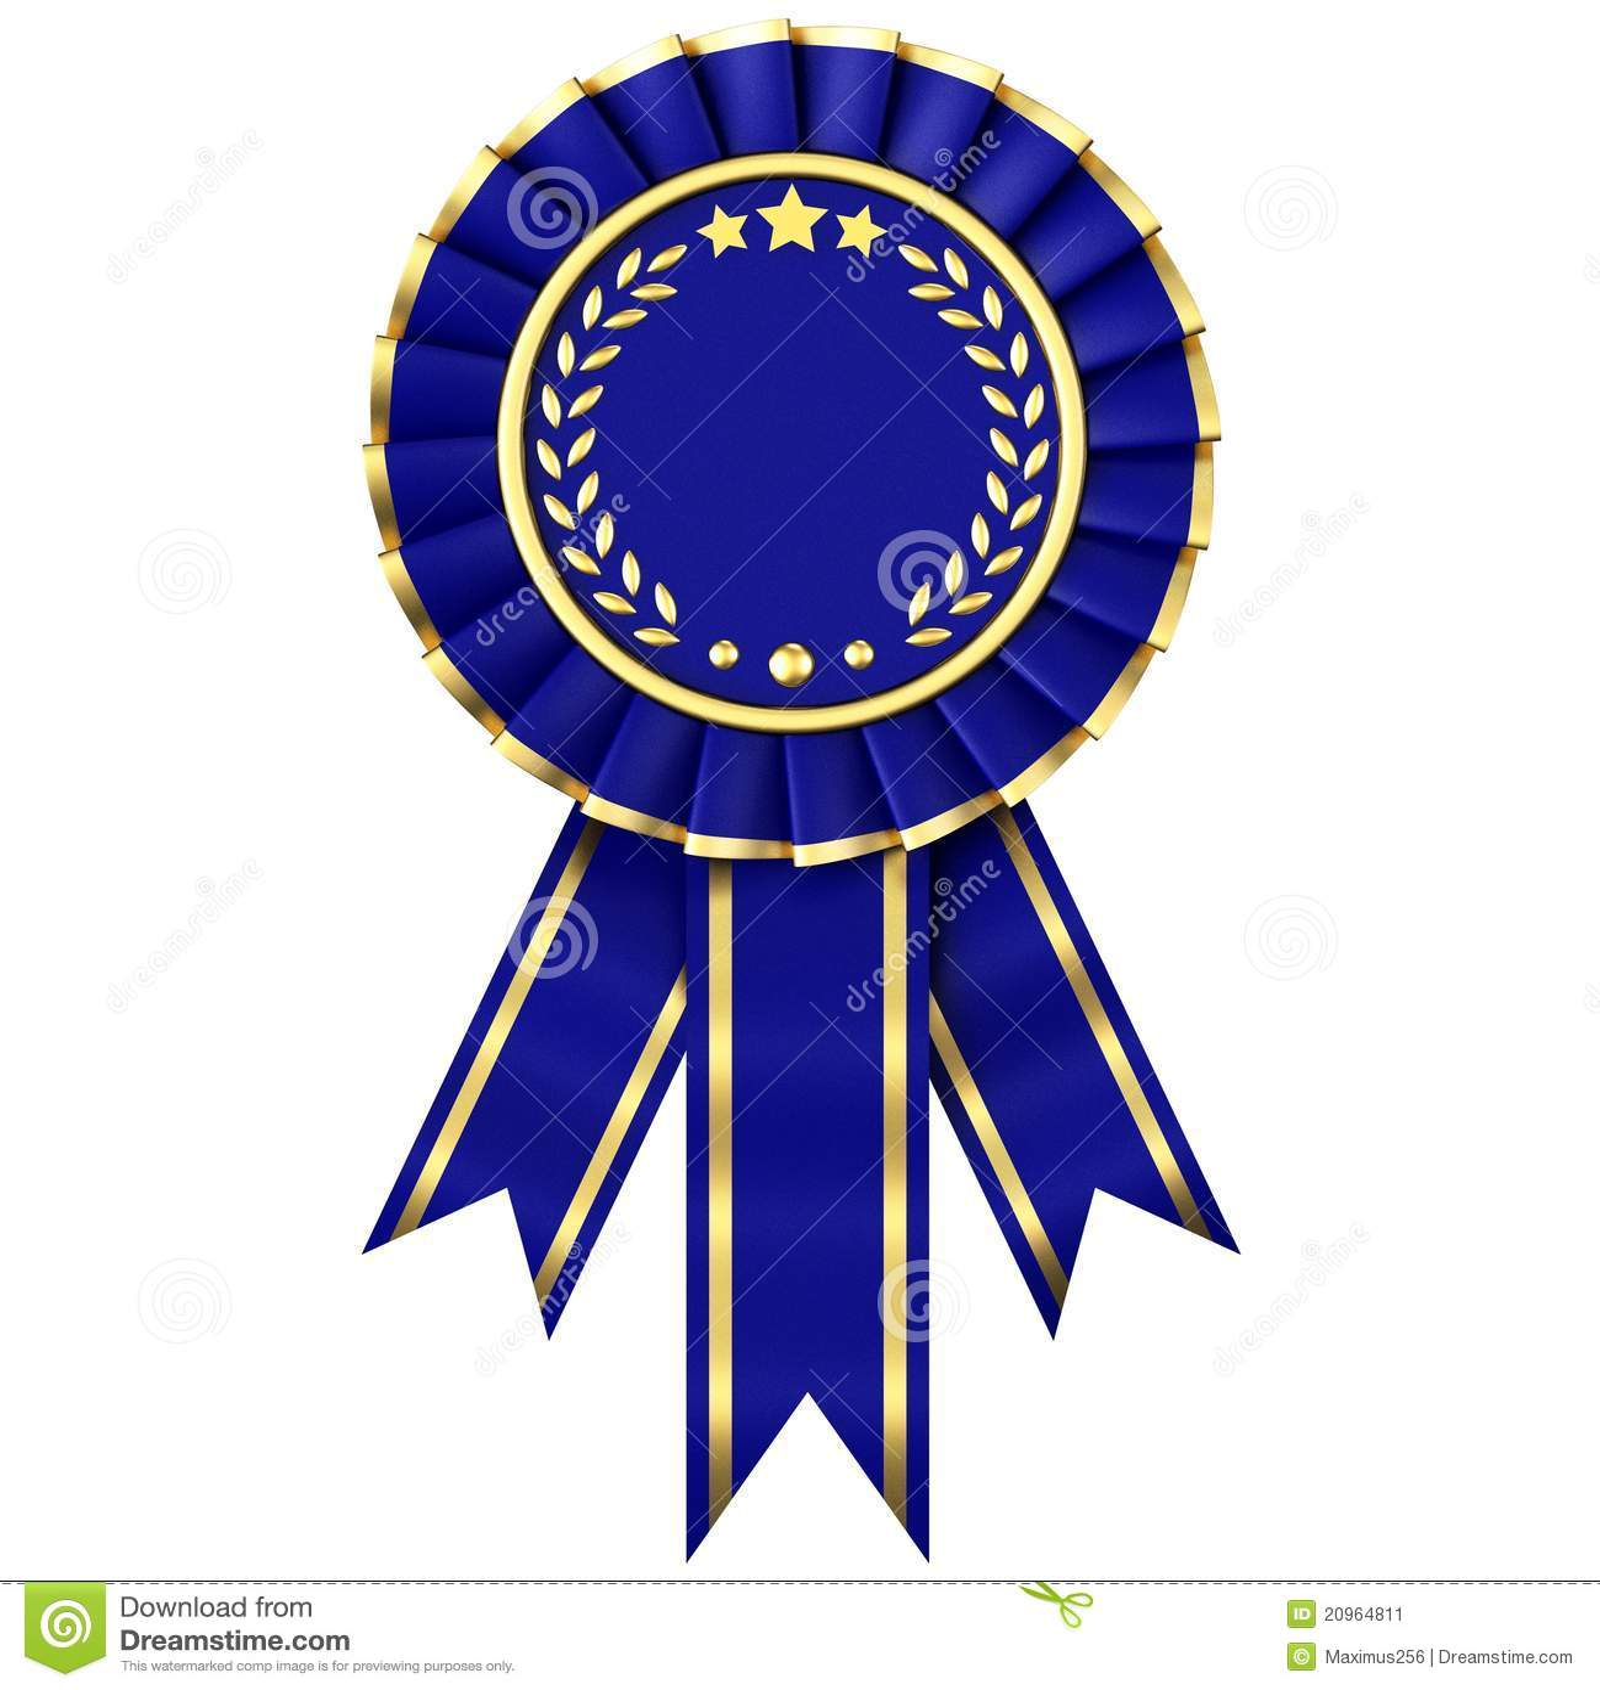 1st prize ribbon template - blue ribbon award stock illustration illustration of